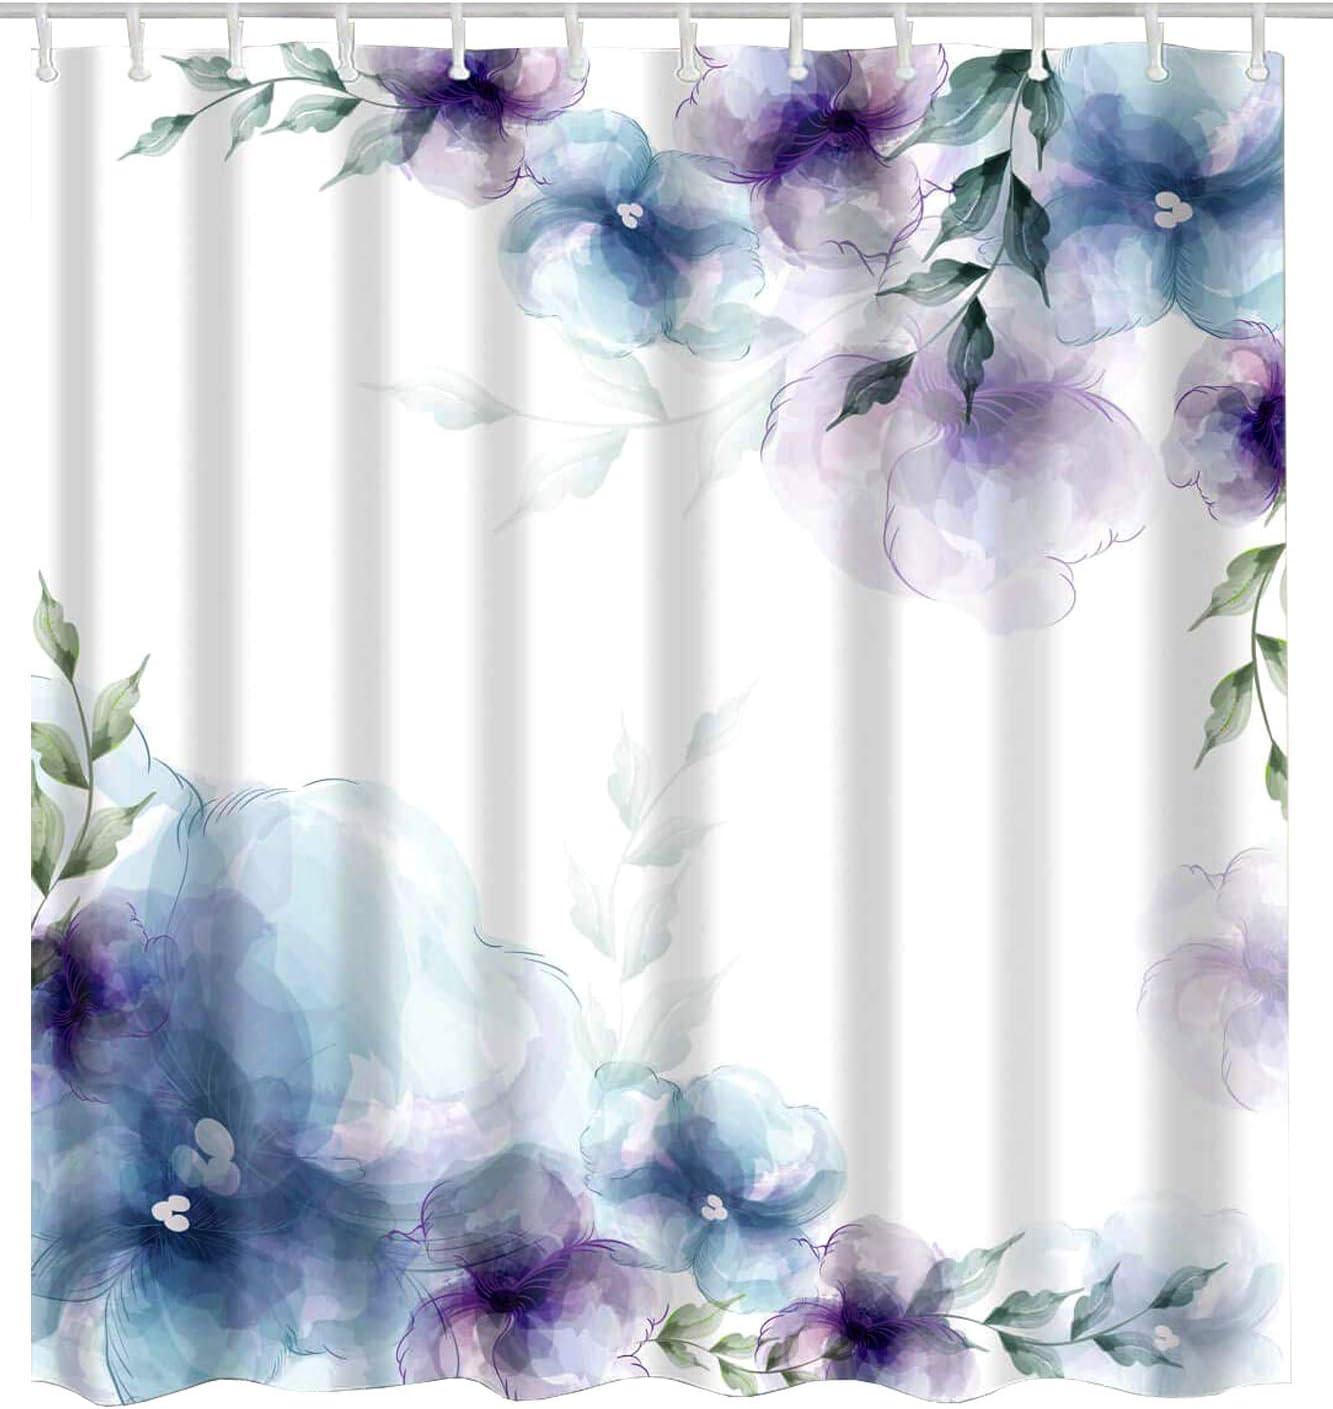 BROSHAN Watercolor Flower Bath Decor Shower Curtain, Spring Retro Flower Elegant Nature Art Print Bath Curtain, Purple Blue Waterproof Fabric Bathroom Accessories with Hooks,72 x 72